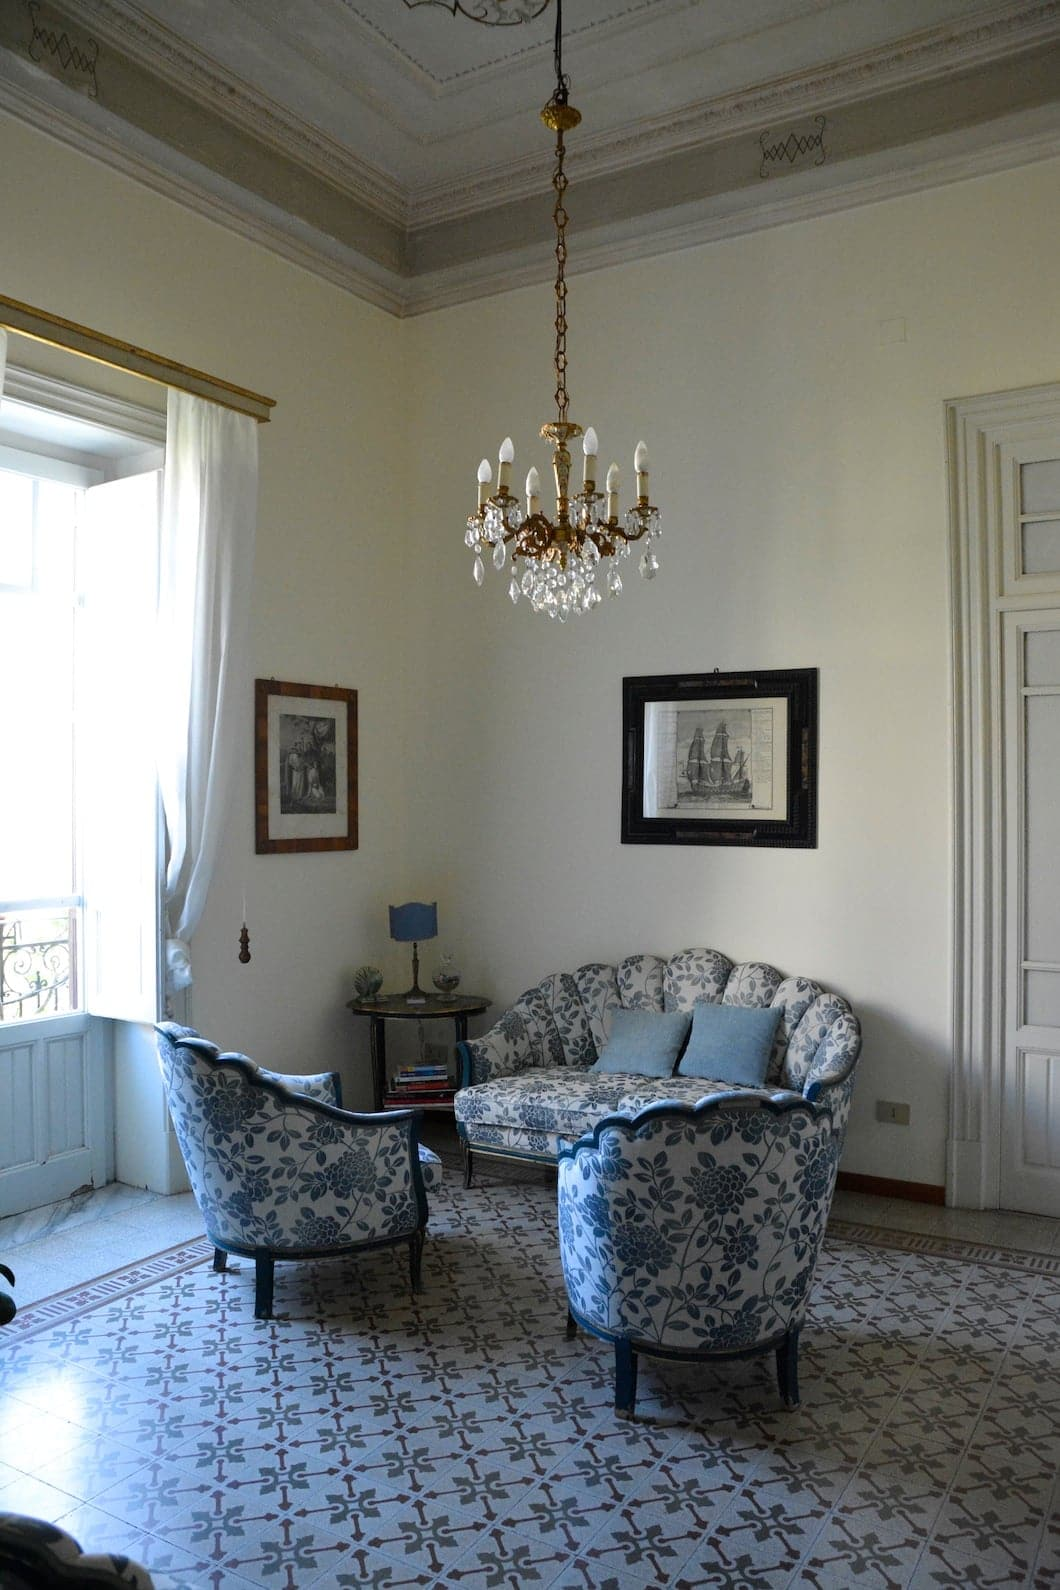 Chambre d'hôtes l'Olivella à Palerme en Sicile - 22 v'la Scarlett